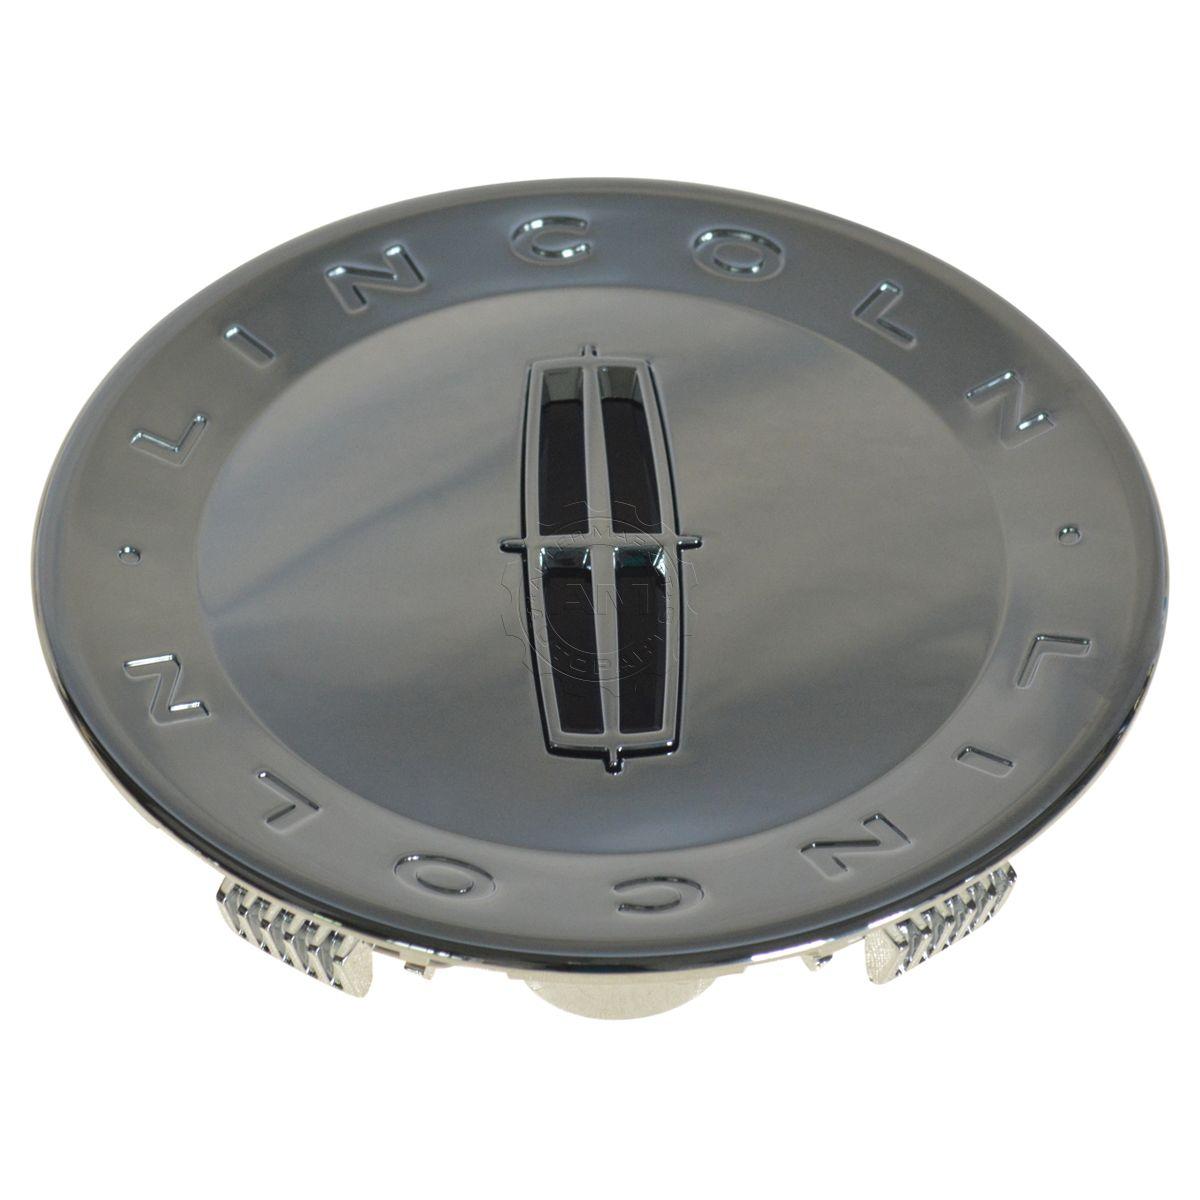 2009 Lincoln Town Car For Sale: OEM 9W1Z-1130-B Wheel Hub Center Cap Chrome For Lincoln